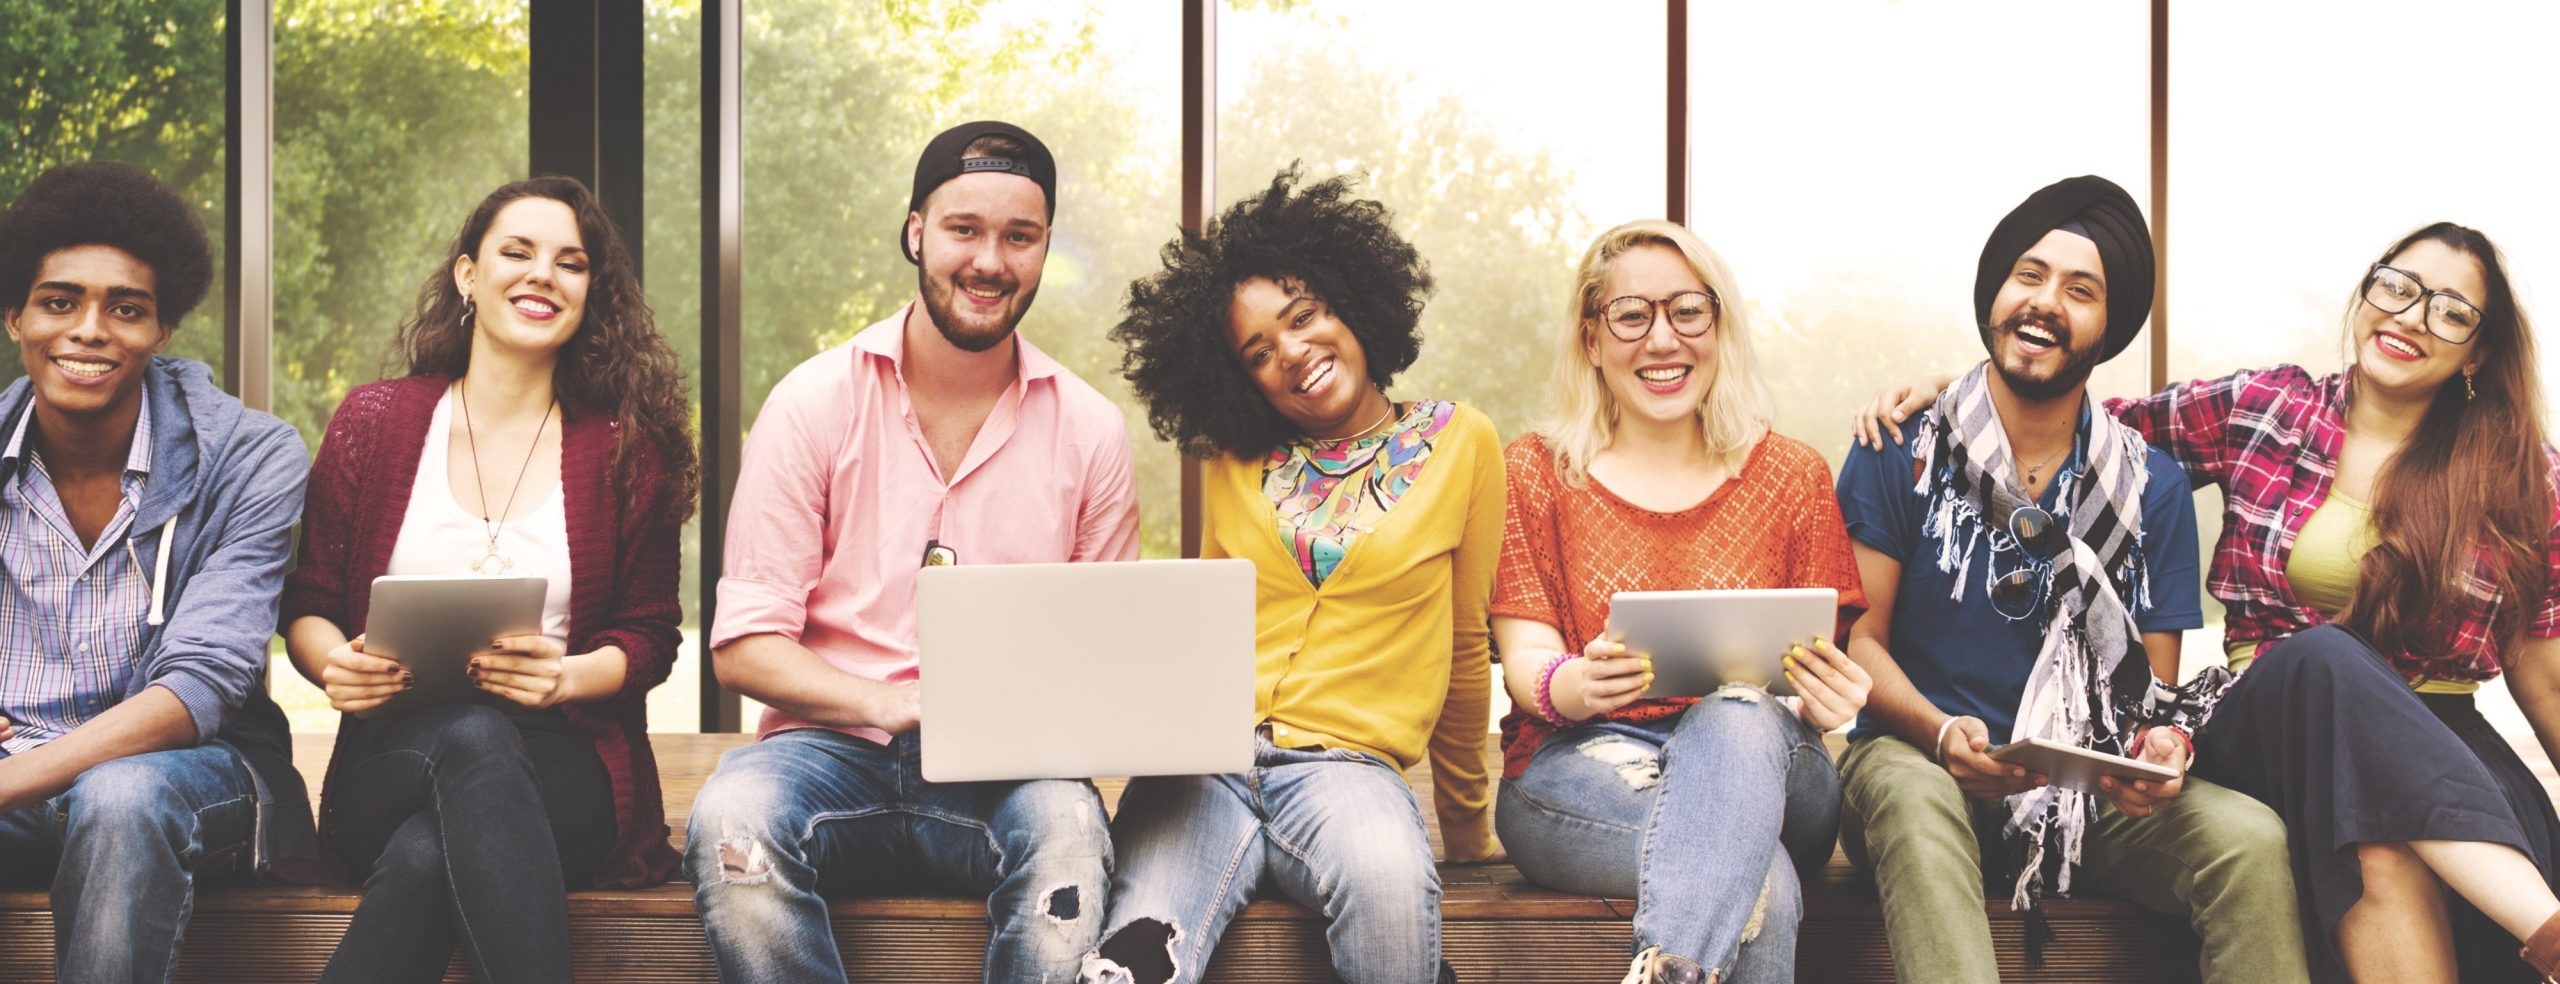 Seeking Synergy Through University-Business Apprenticeships